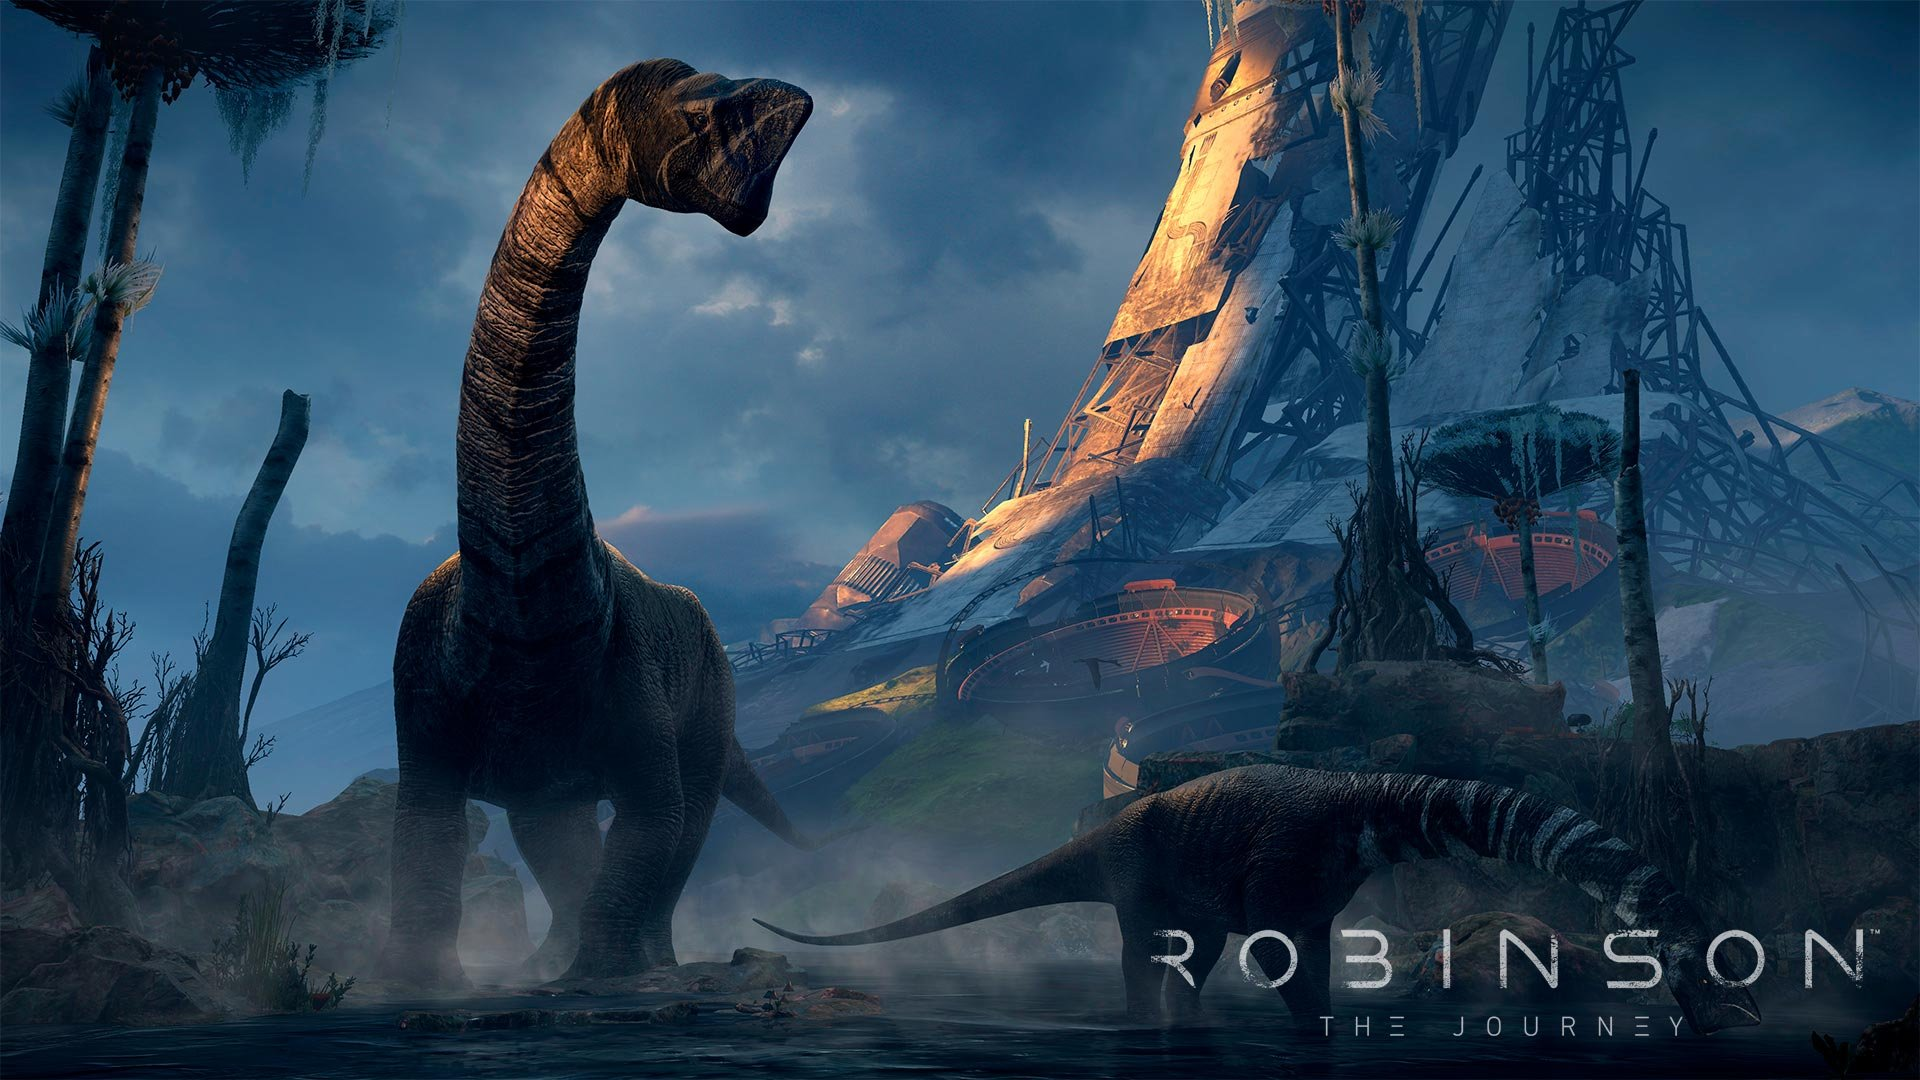 robinson_the_journey-3561662.jpg